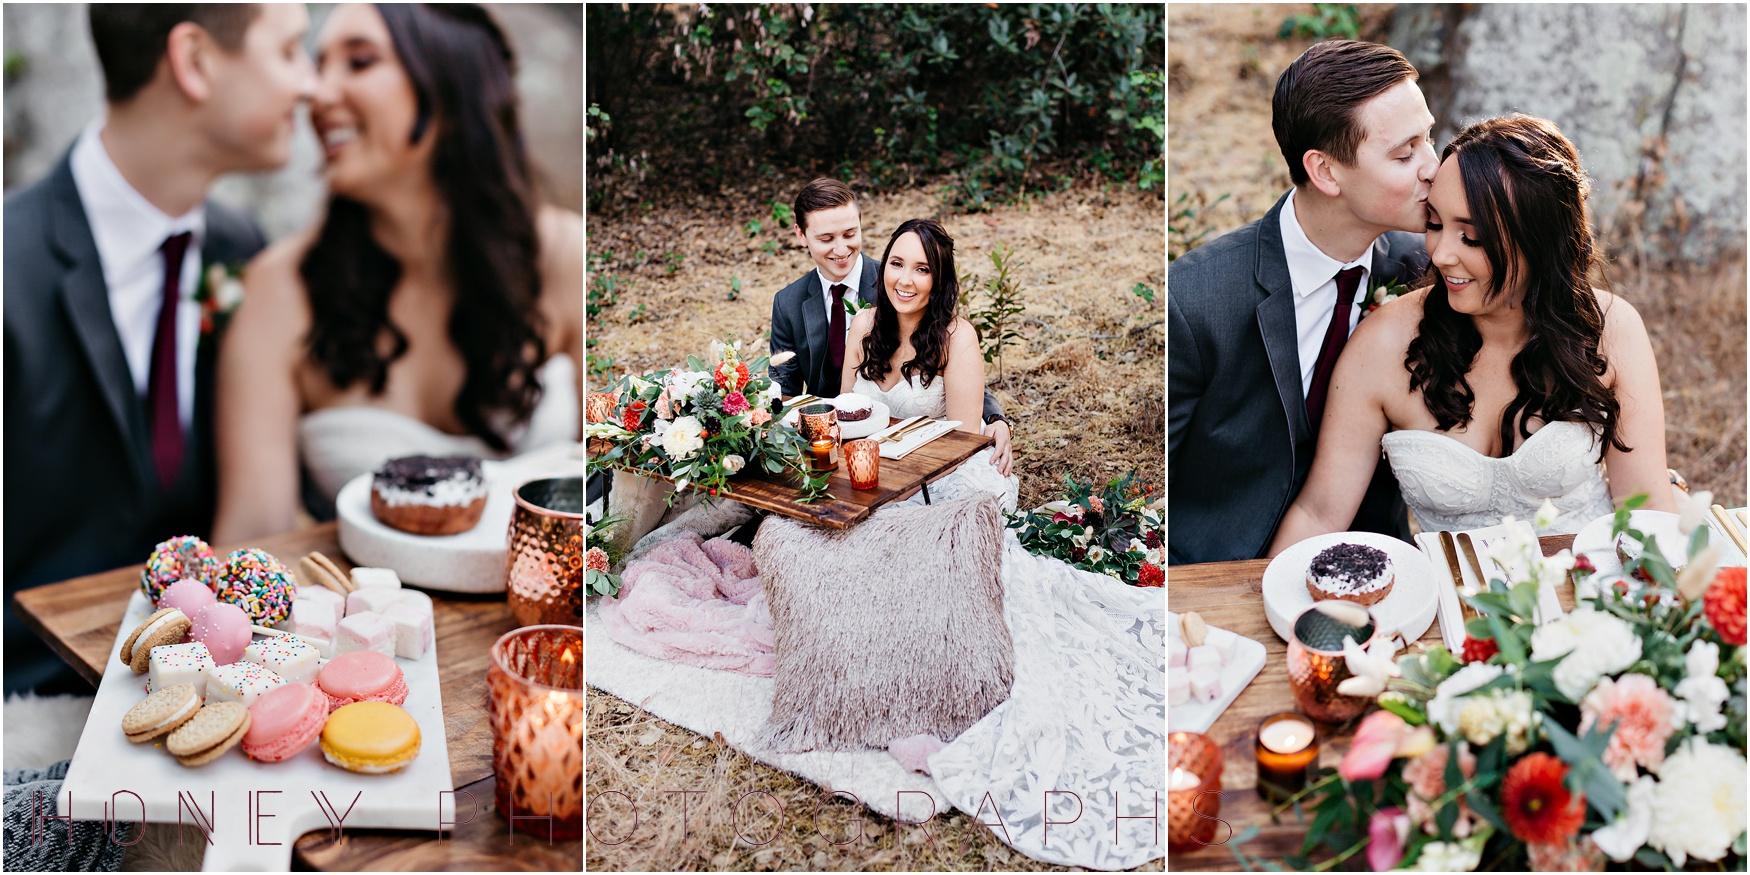 picnic-wedding-rustic-sweetheart-table-felicita-park-boho09.jpg